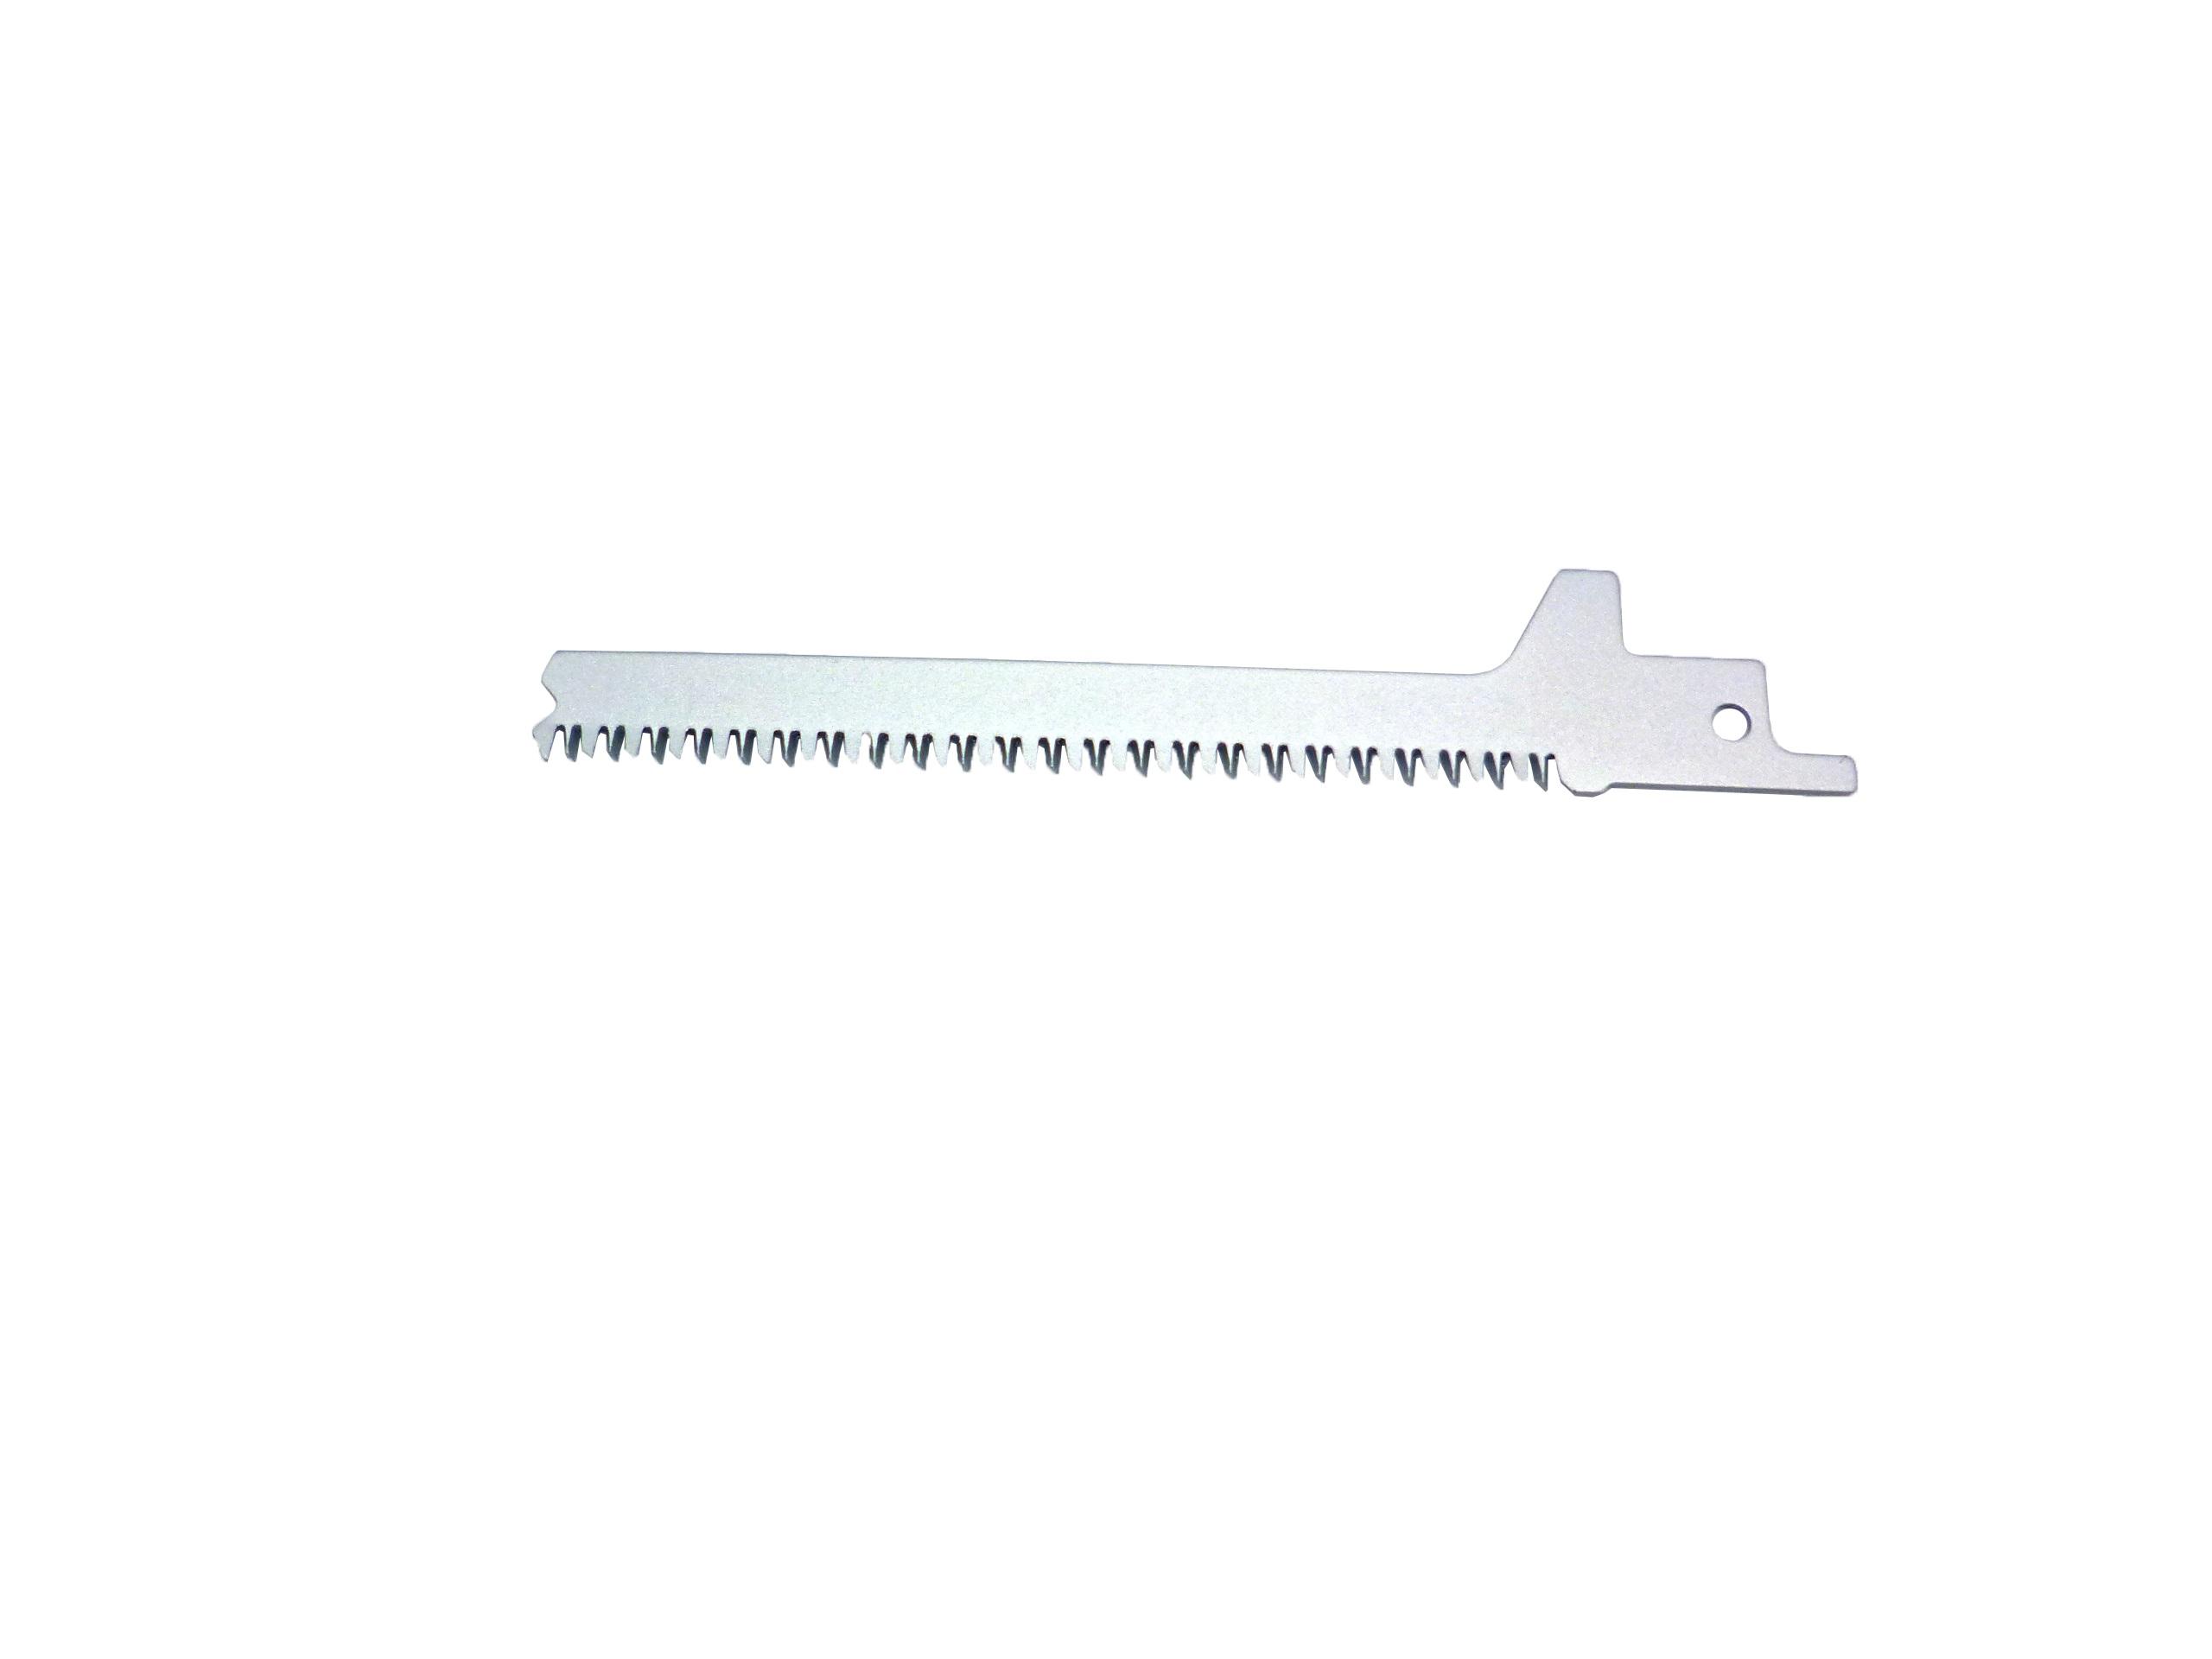 電動ノコギリ(万能型)曲線用替刃